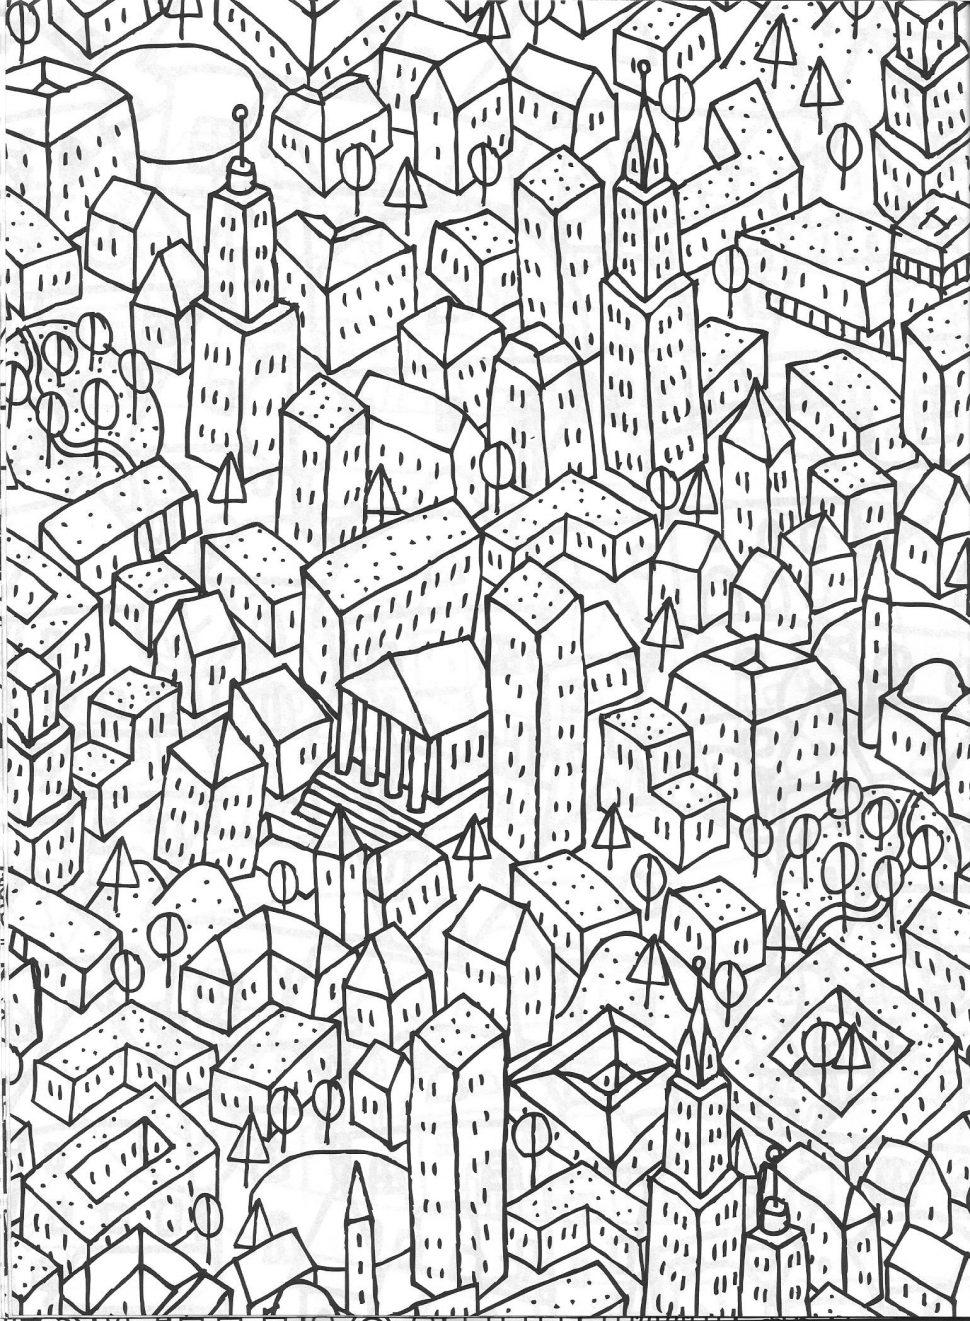 970x1321 Coloring Splendi Cityscape Coloring Book Image Inspirations